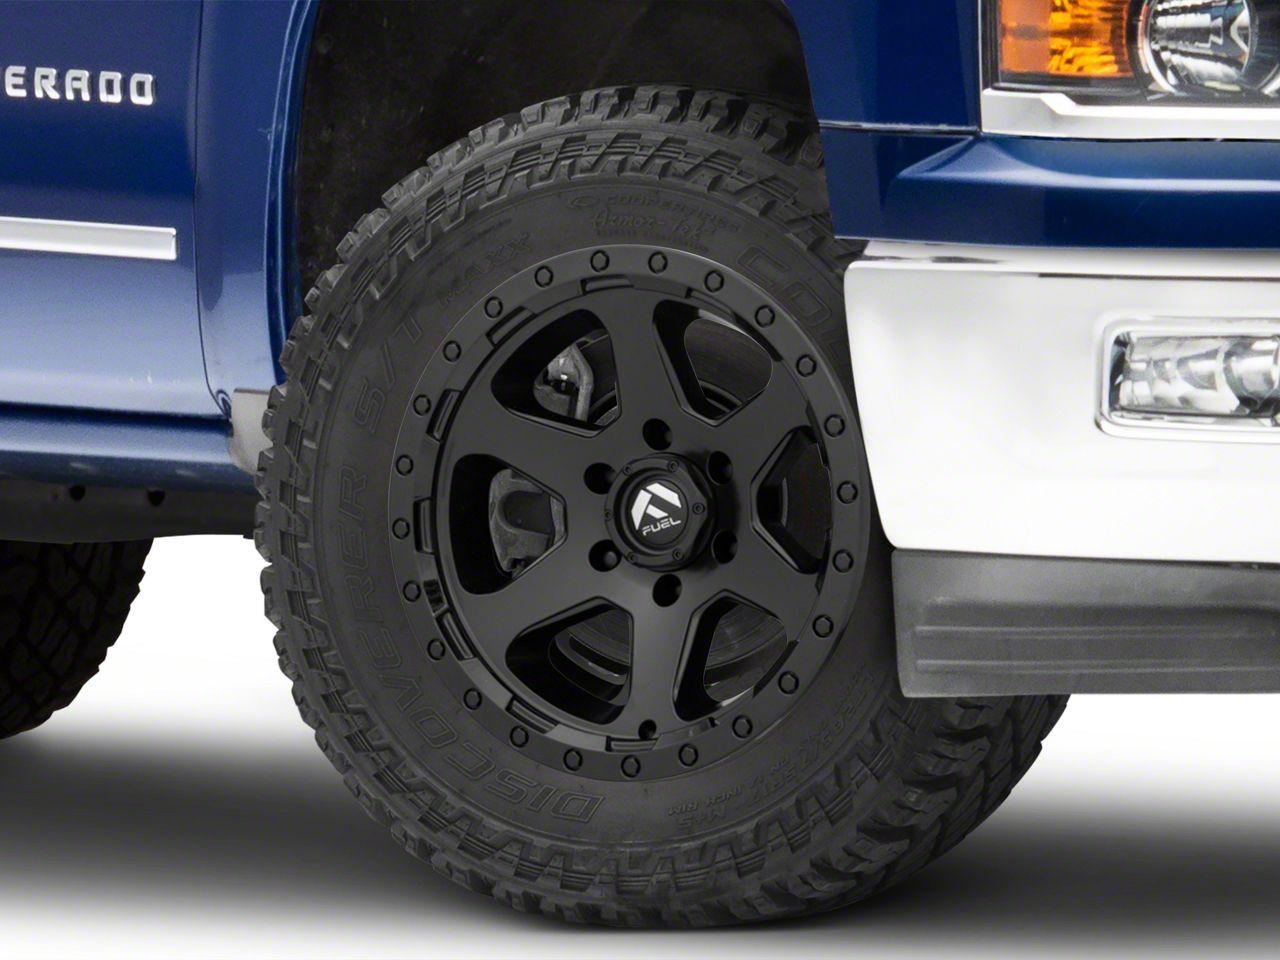 Fuel Wheels Ripper Matte Black 6-Lug Wheel - 20x10 (99-18 Silverado 1500)